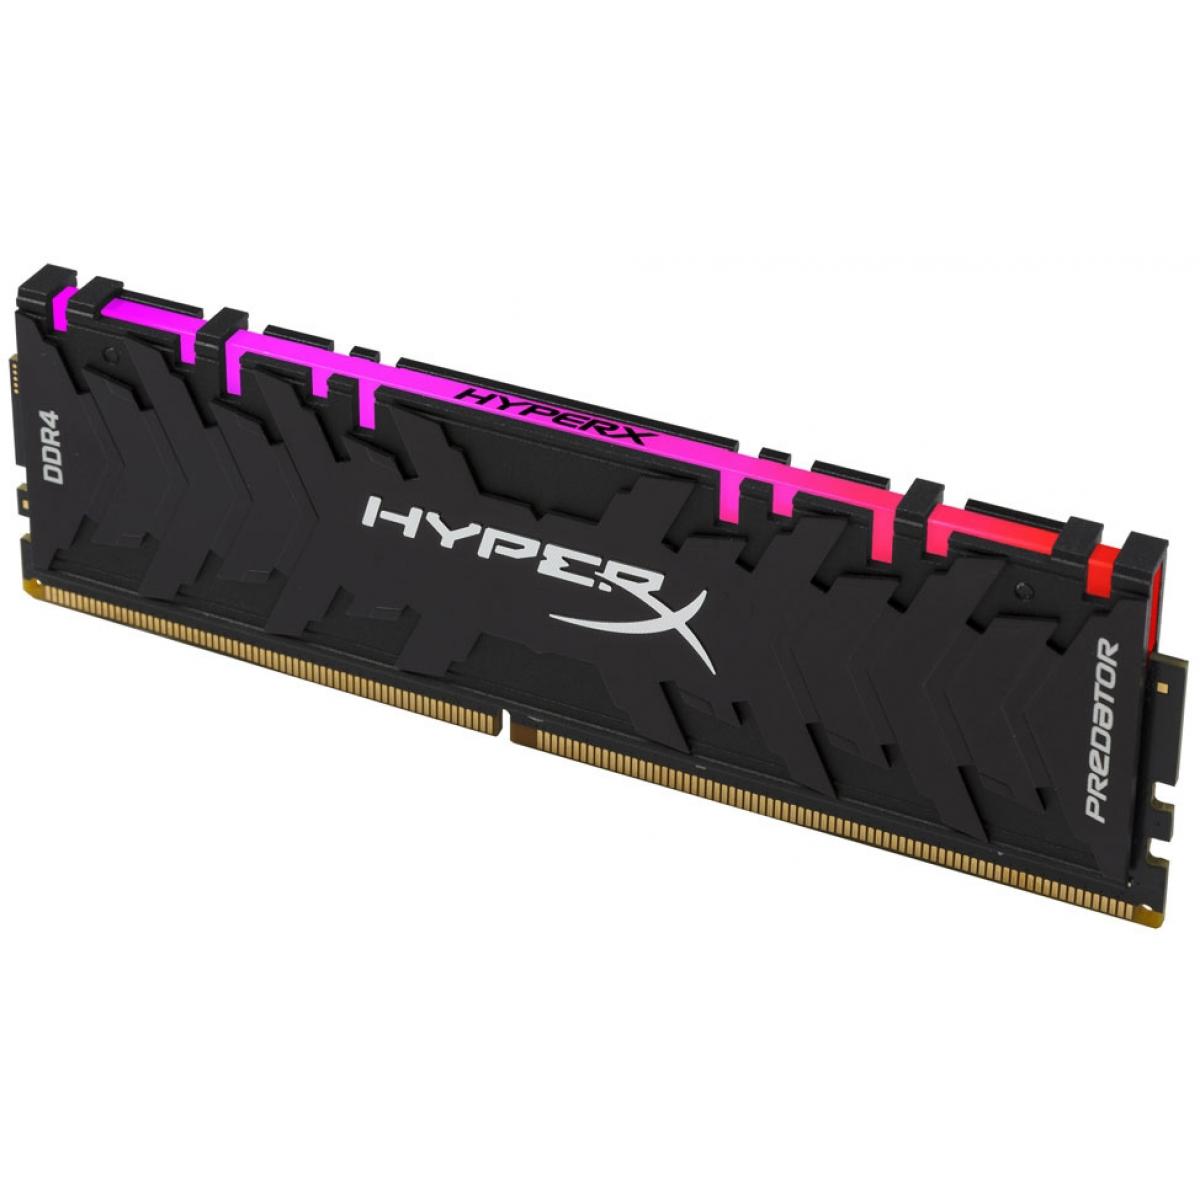 Memória DDR4 Kingston HyperX Predator RGB, 8GB 3200MHz, HX432C16PB3A/8